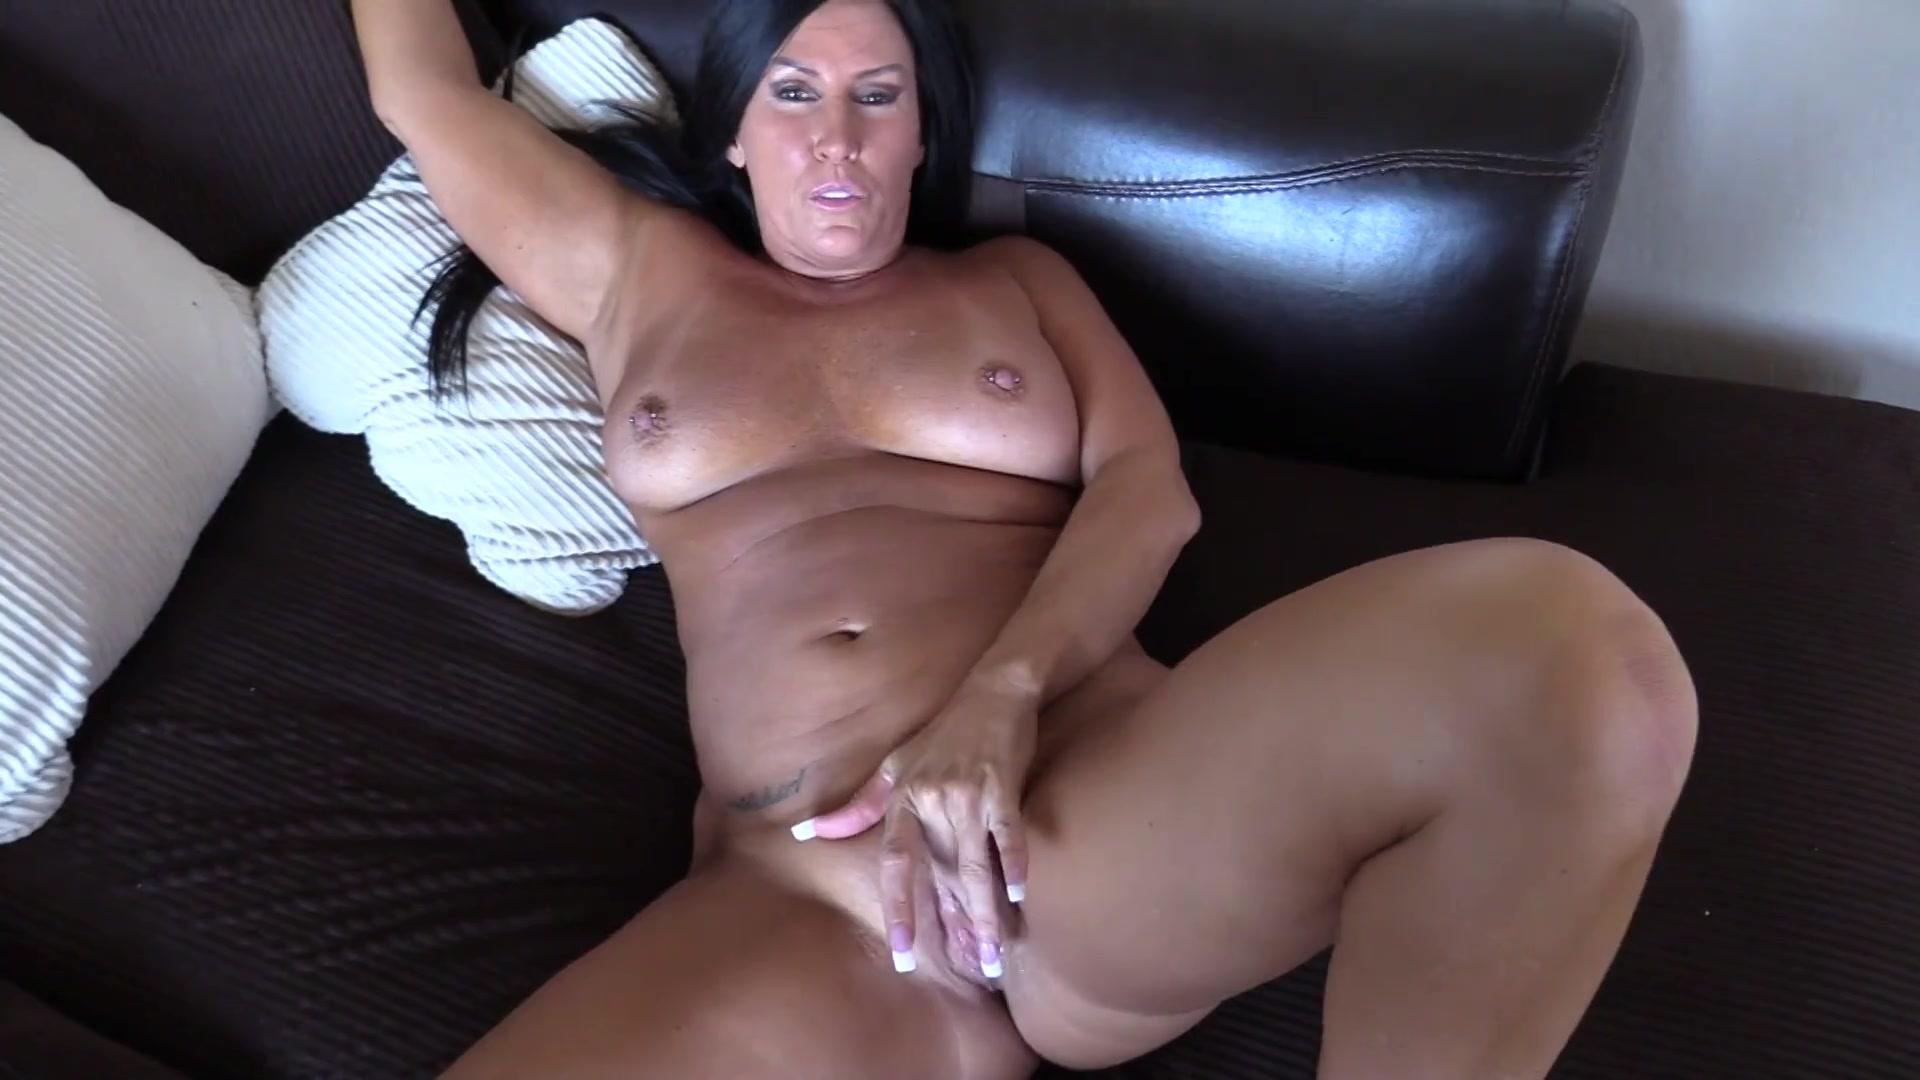 Nasty tanned MILF incredible POV sex